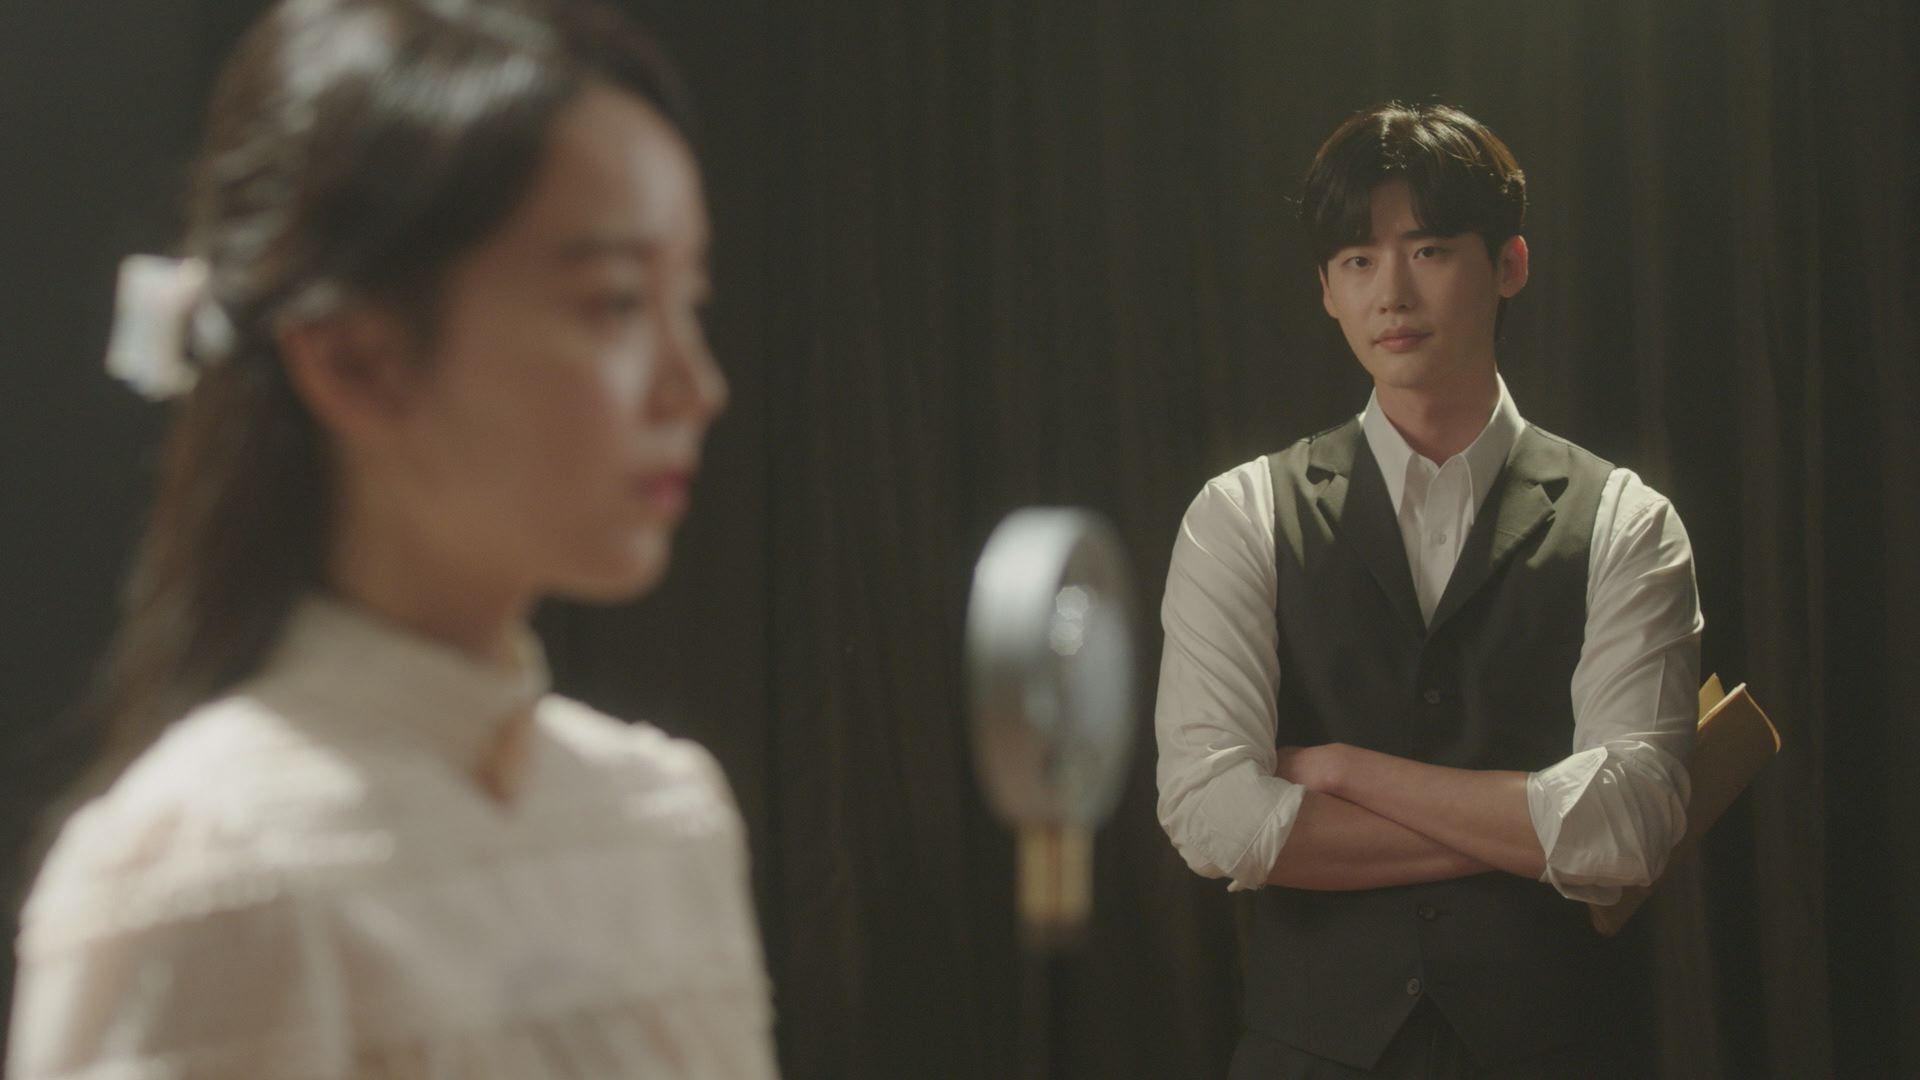 Shin Hye Sun et Lee Jong Suk dans Hymn of Death